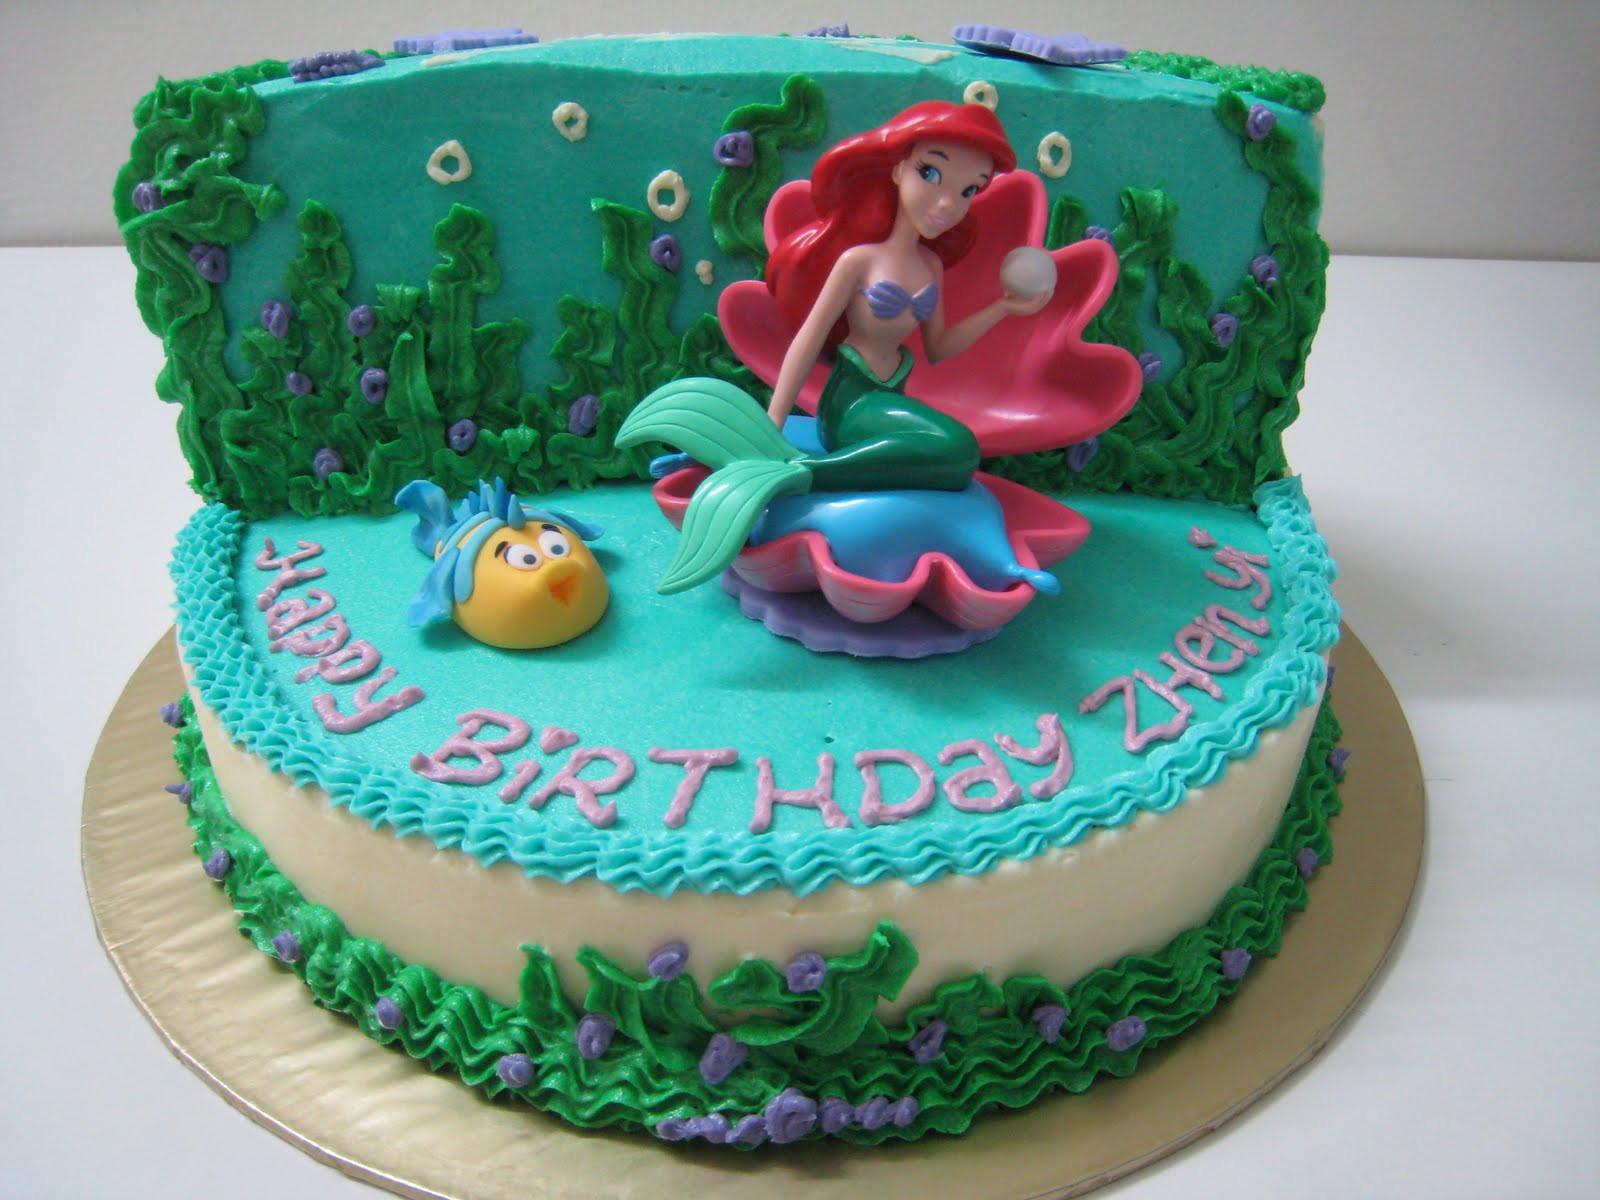 Mermaid Birthday Cake  Mermaid Cakes – Decoration Ideas